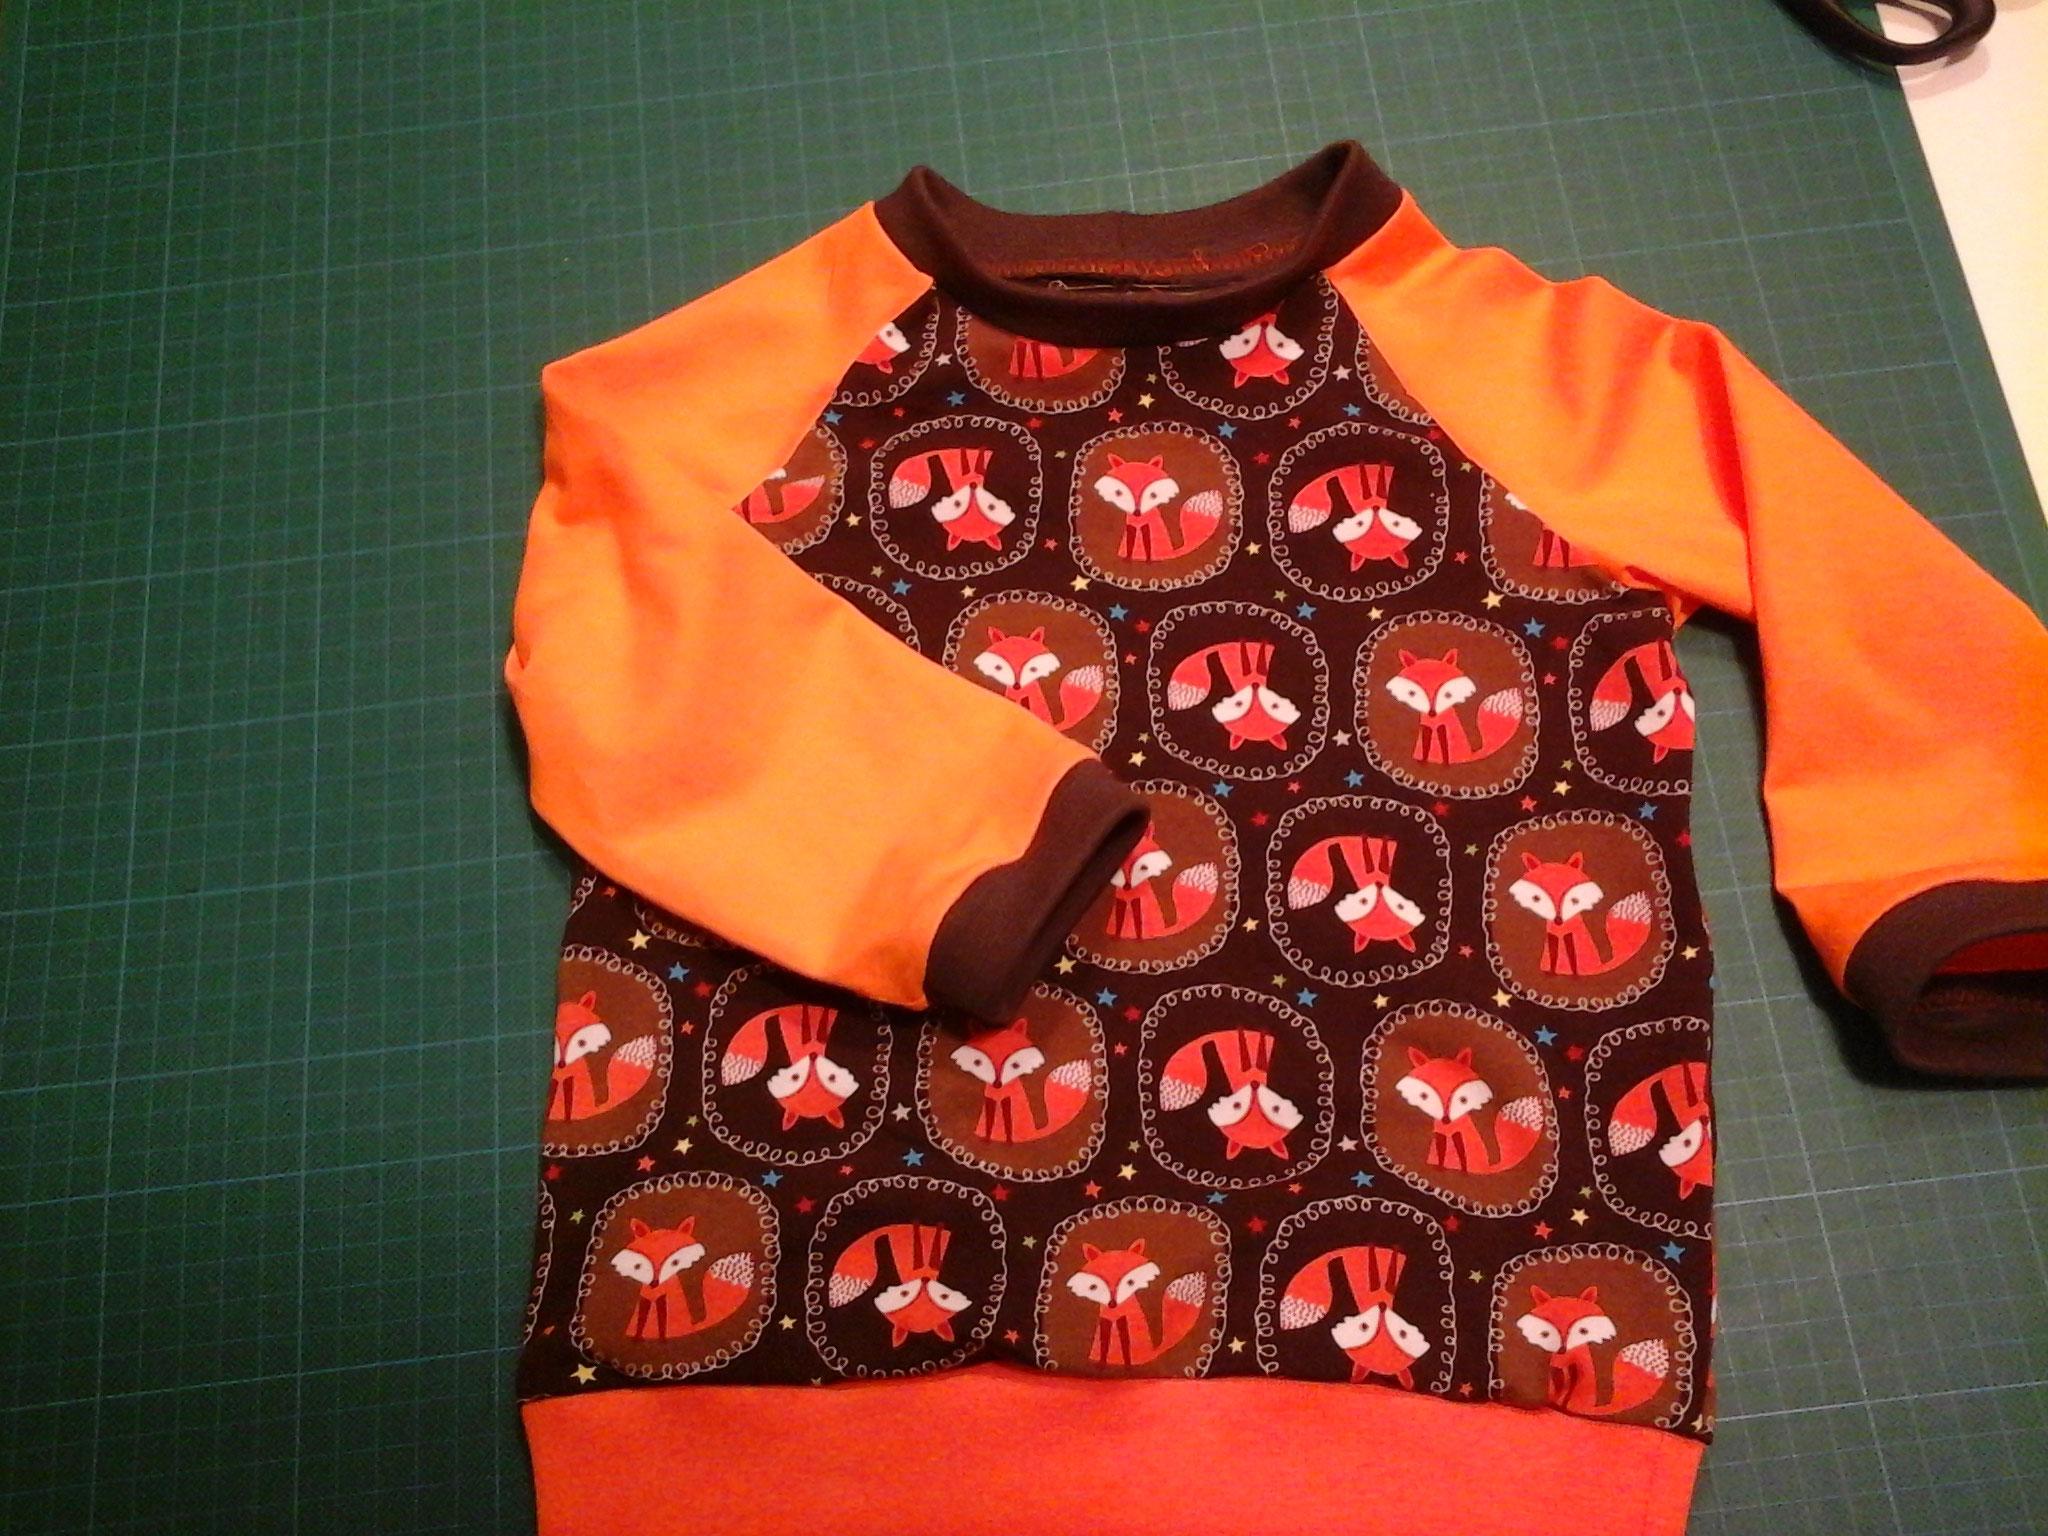 Kinder-Basicshirt - Kurs - tolles Modell von S.